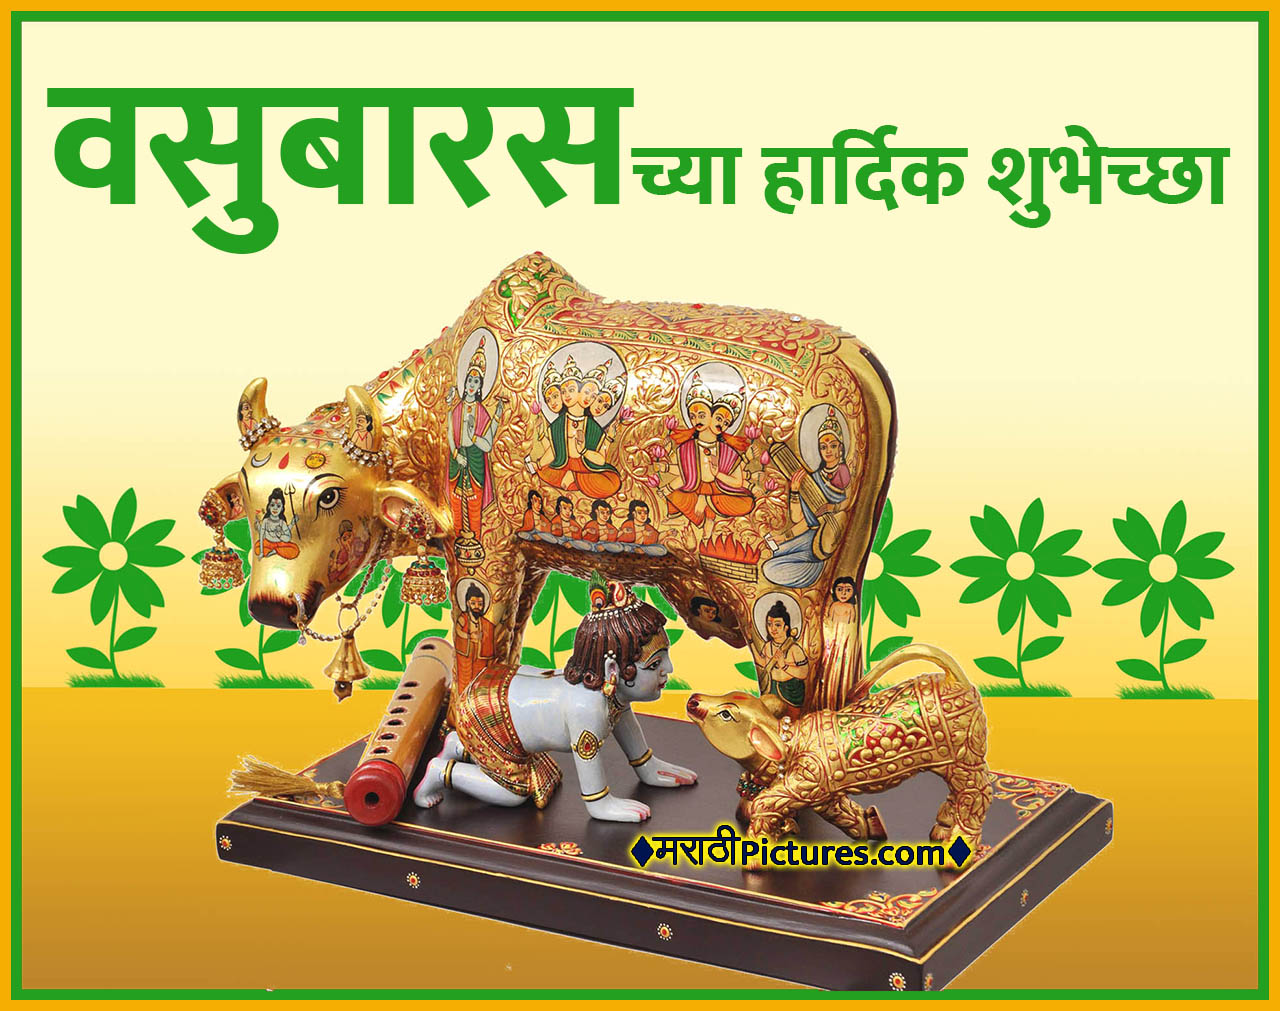 Vasubaras Chya Hardik Shubhechha - Marathi Pictures ... Vadhdivas Chya Hardik Shubhechha